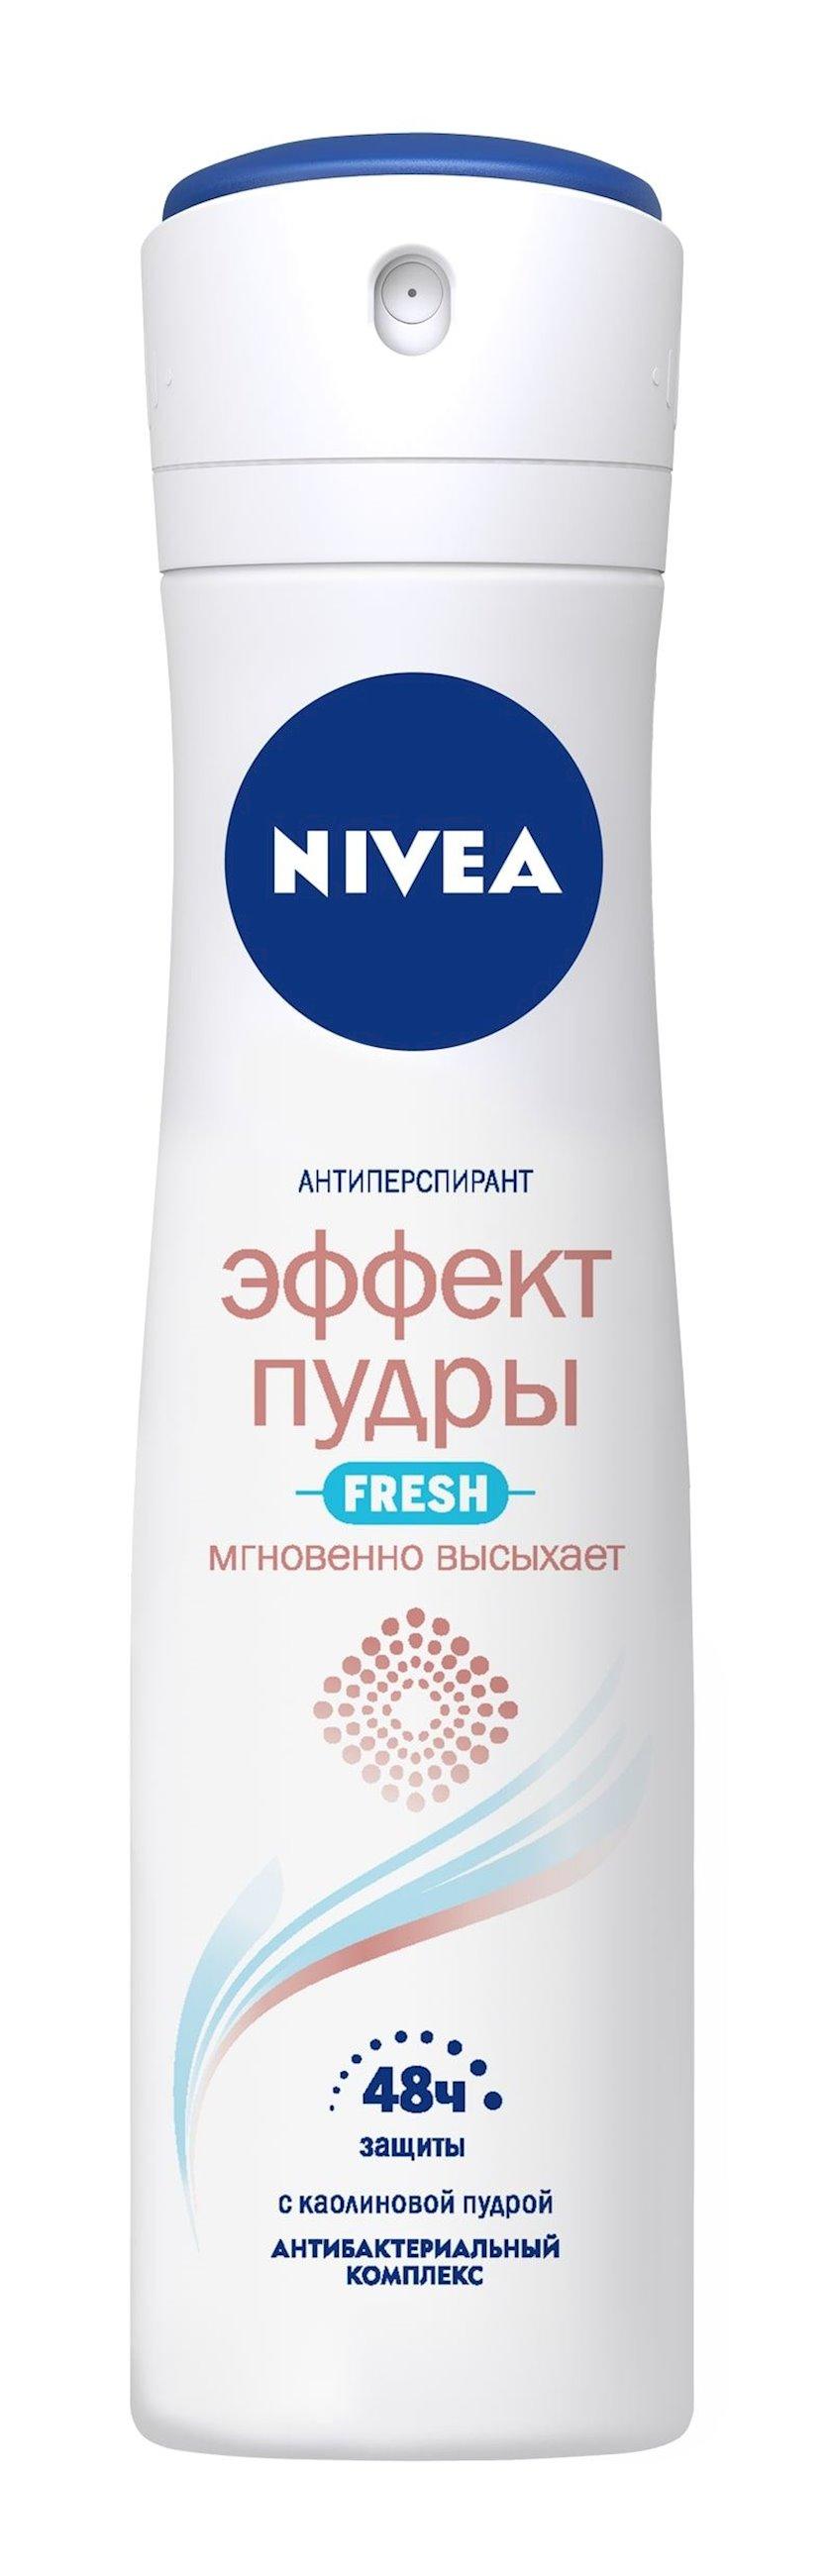 Dezodorant-antiperspirant Nivea Fresh pudra effekti antibakterial kompleks ilə 150 ml